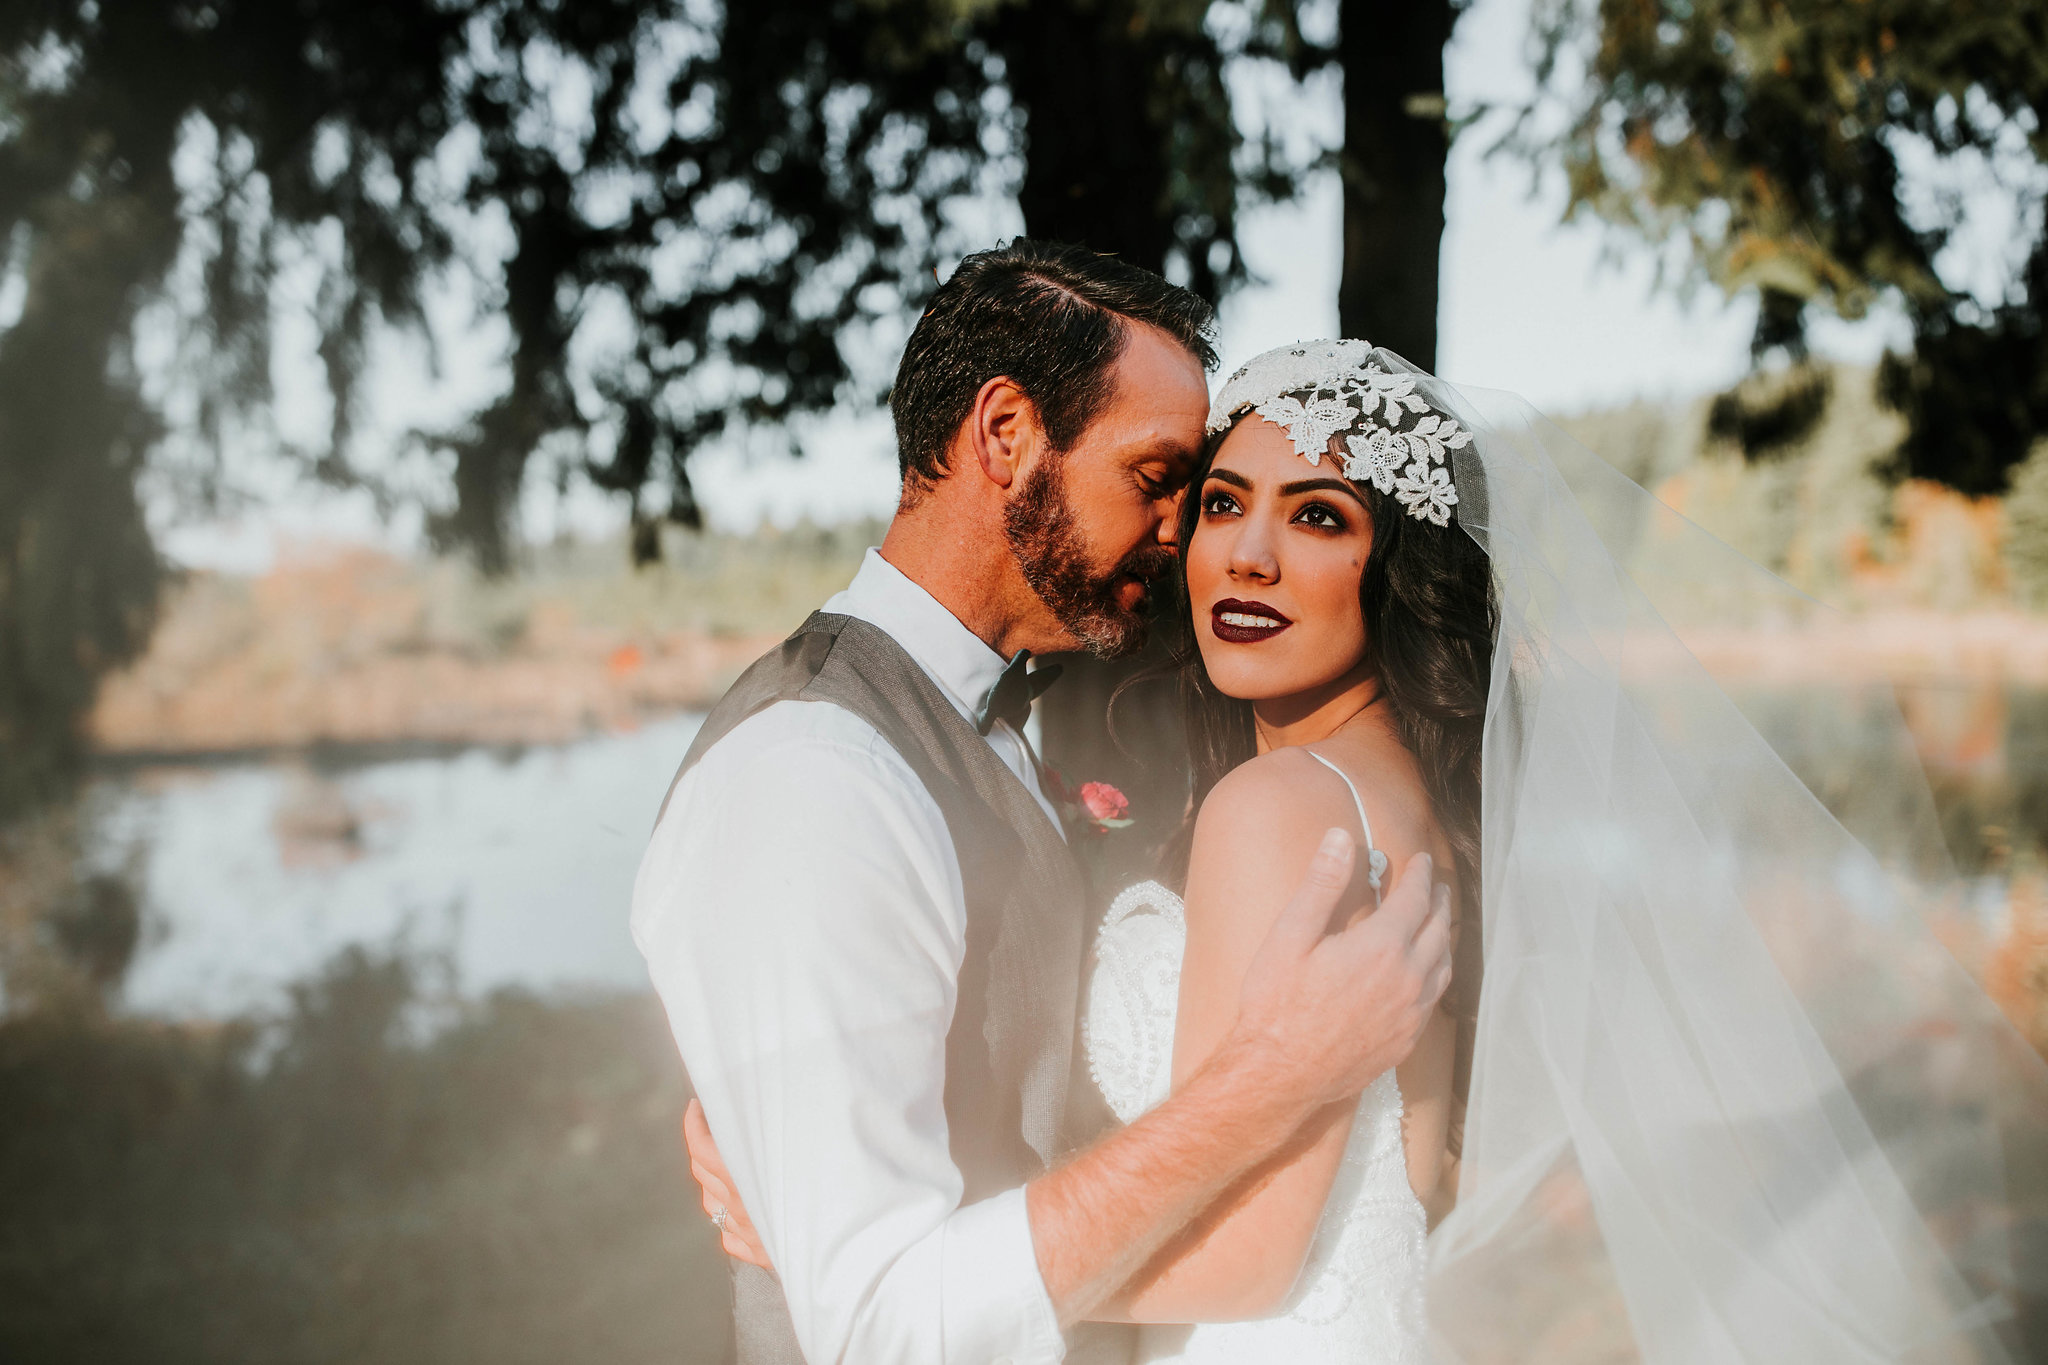 Crystal_Lake_lodge_Wedding_photos_by_Adina_Preston_Weddings_428.JPG